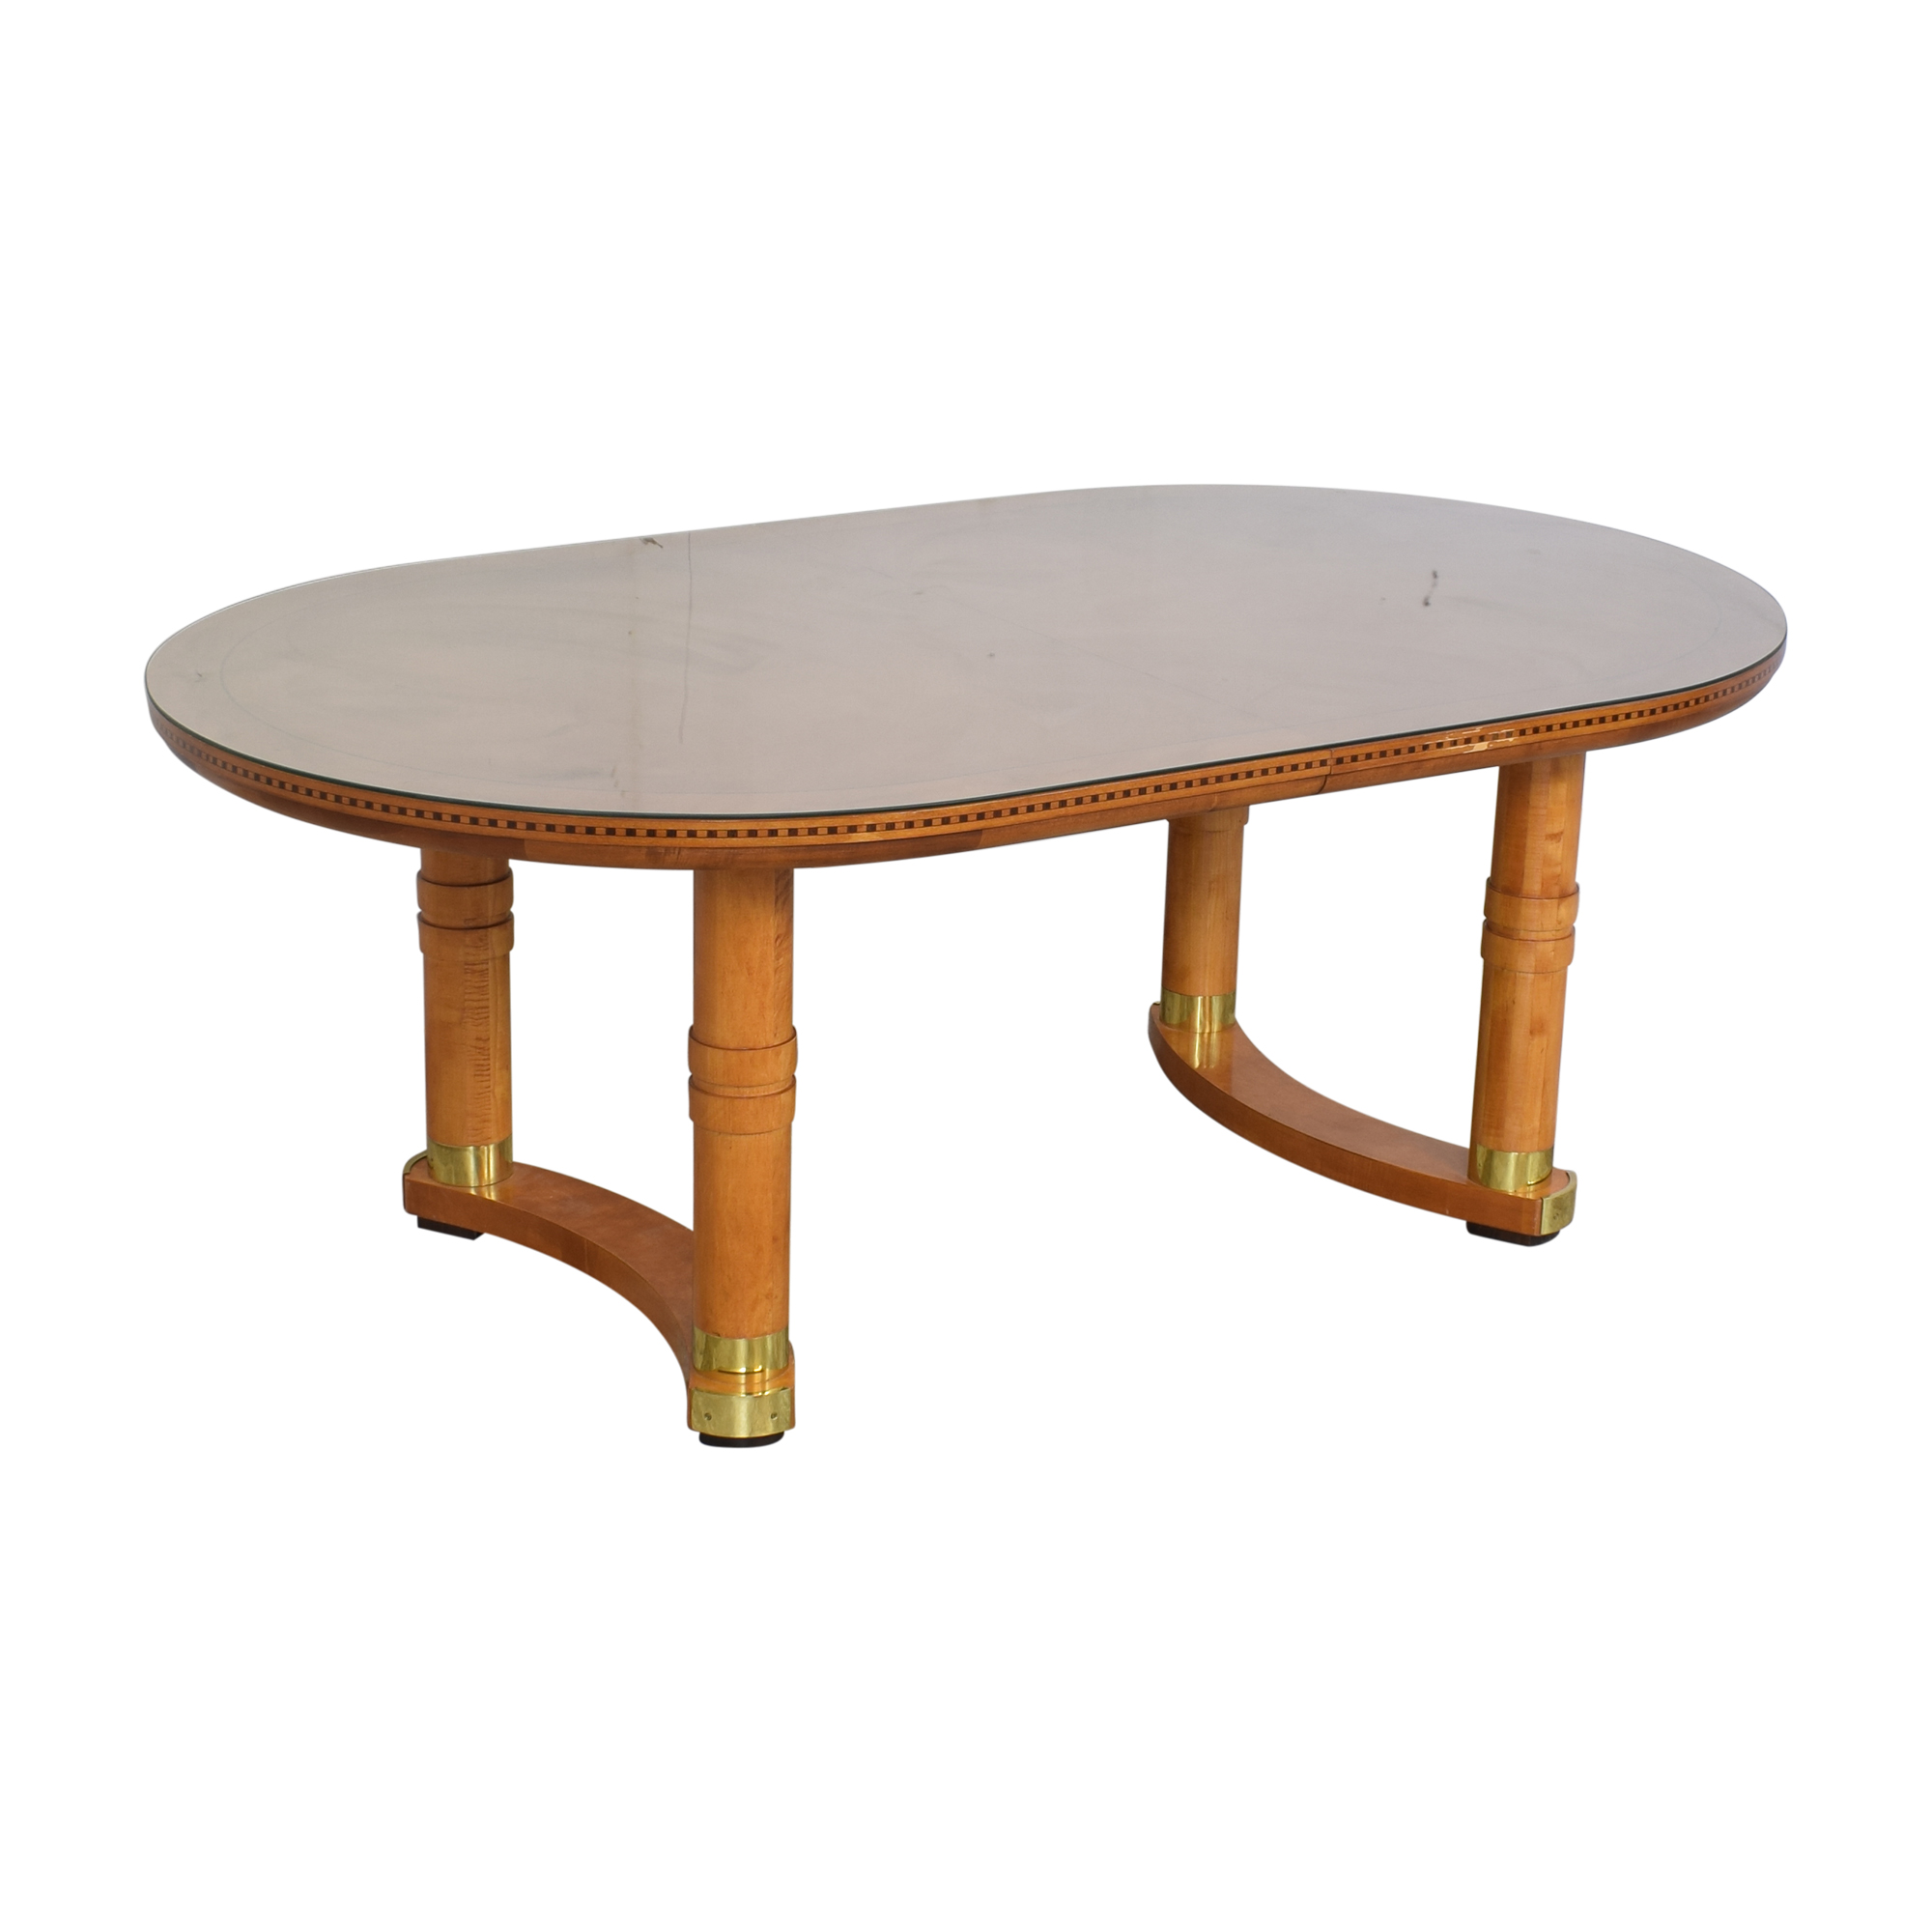 Huffman Koos Huffman Koos Extendable Dining Table on sale